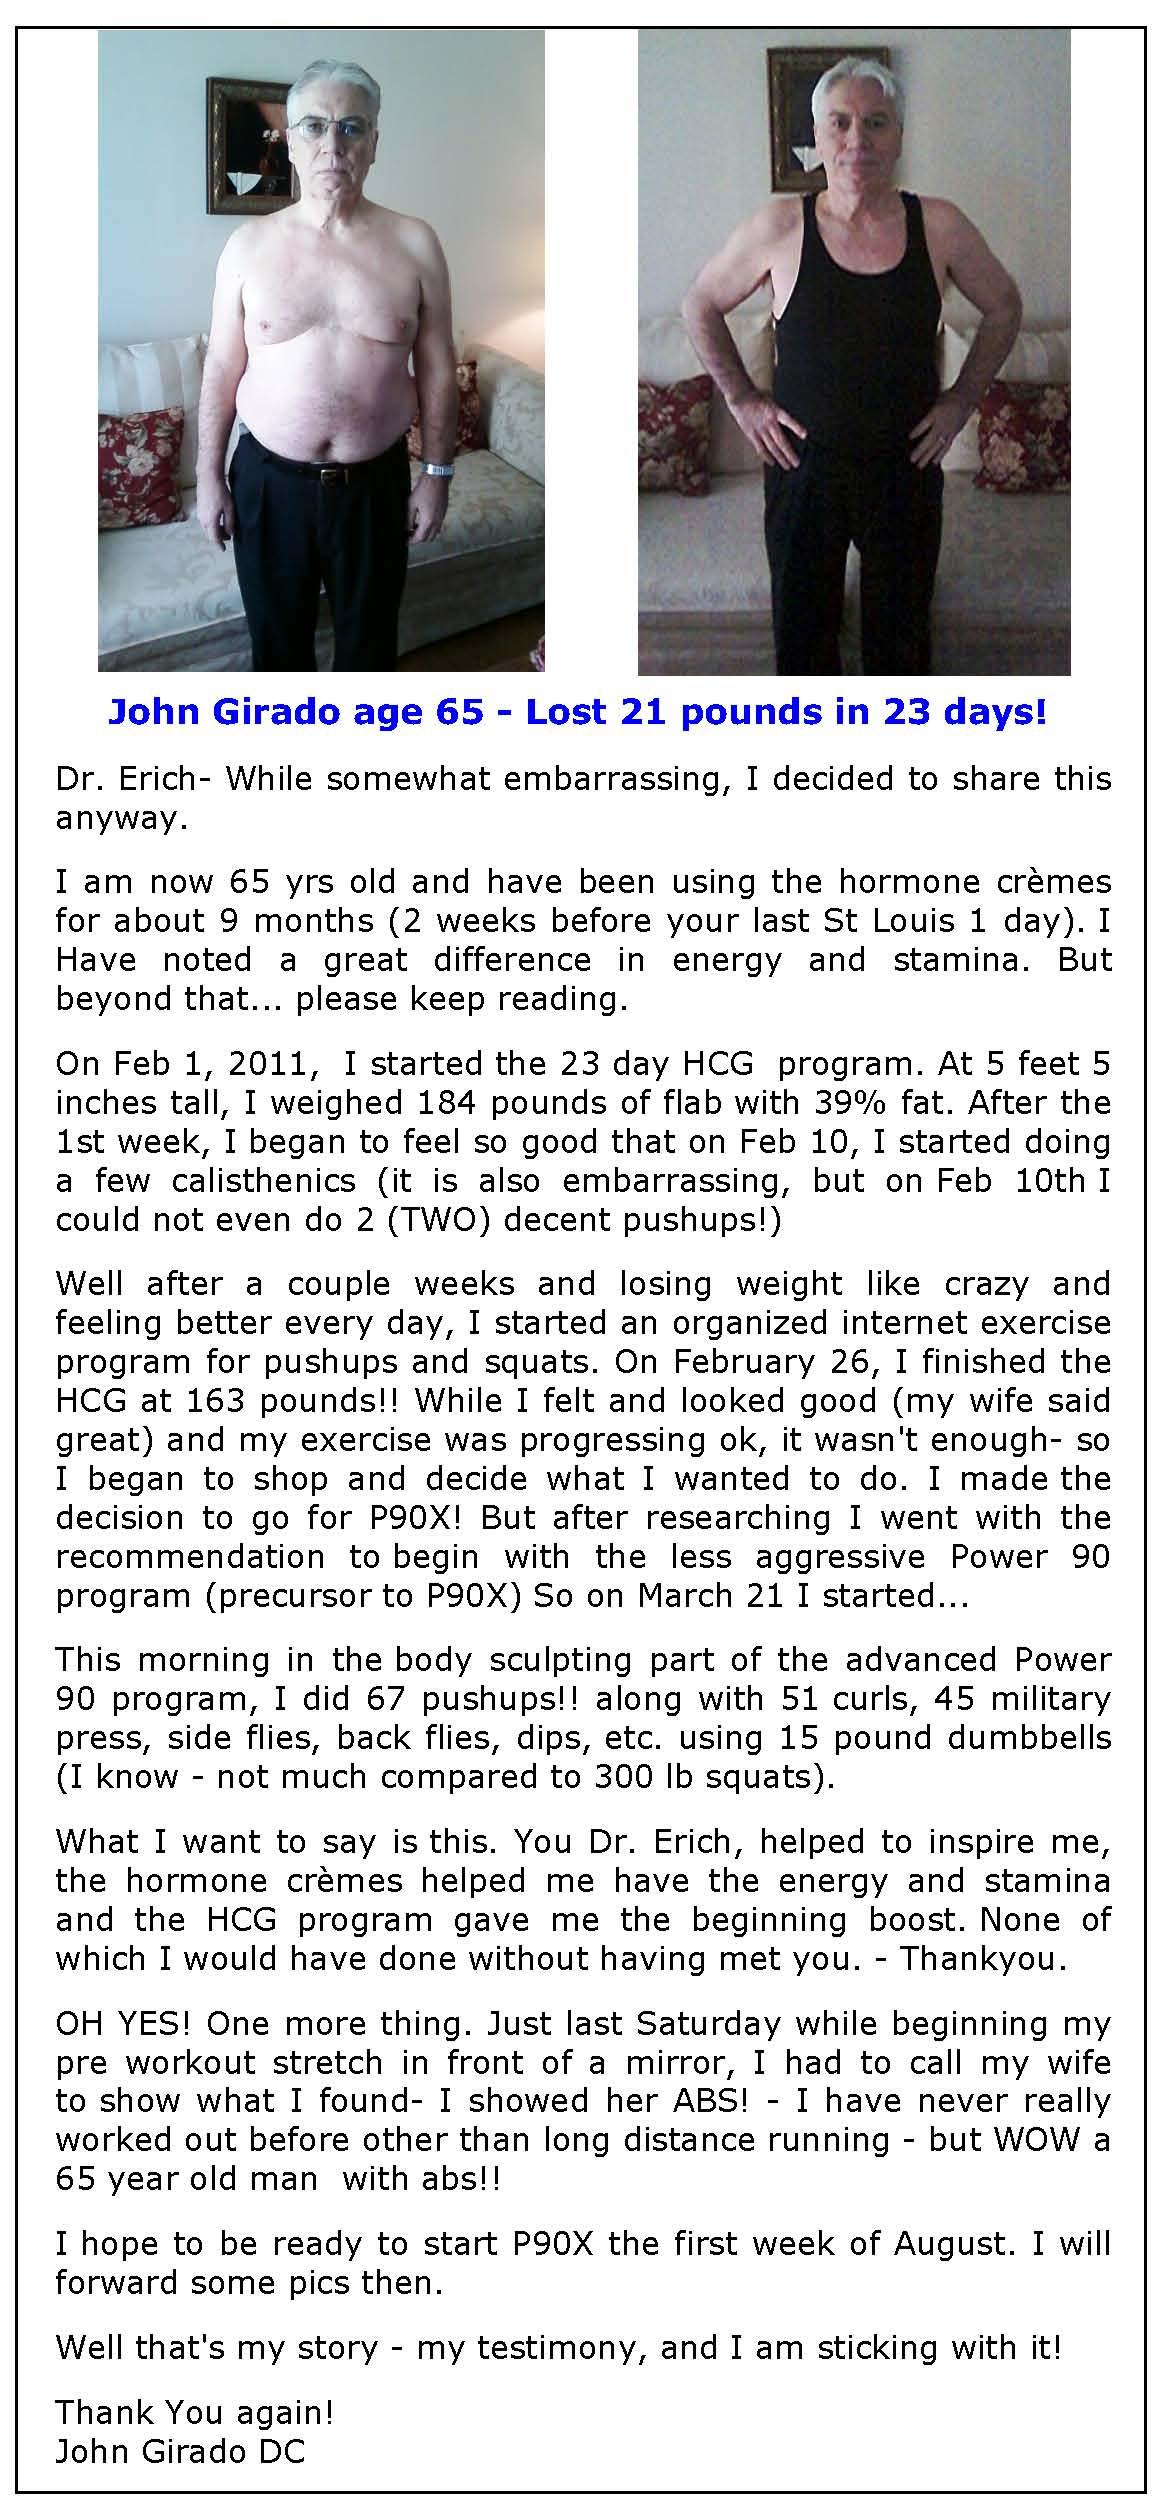 John Girado weightloss story _age 65_.jpg